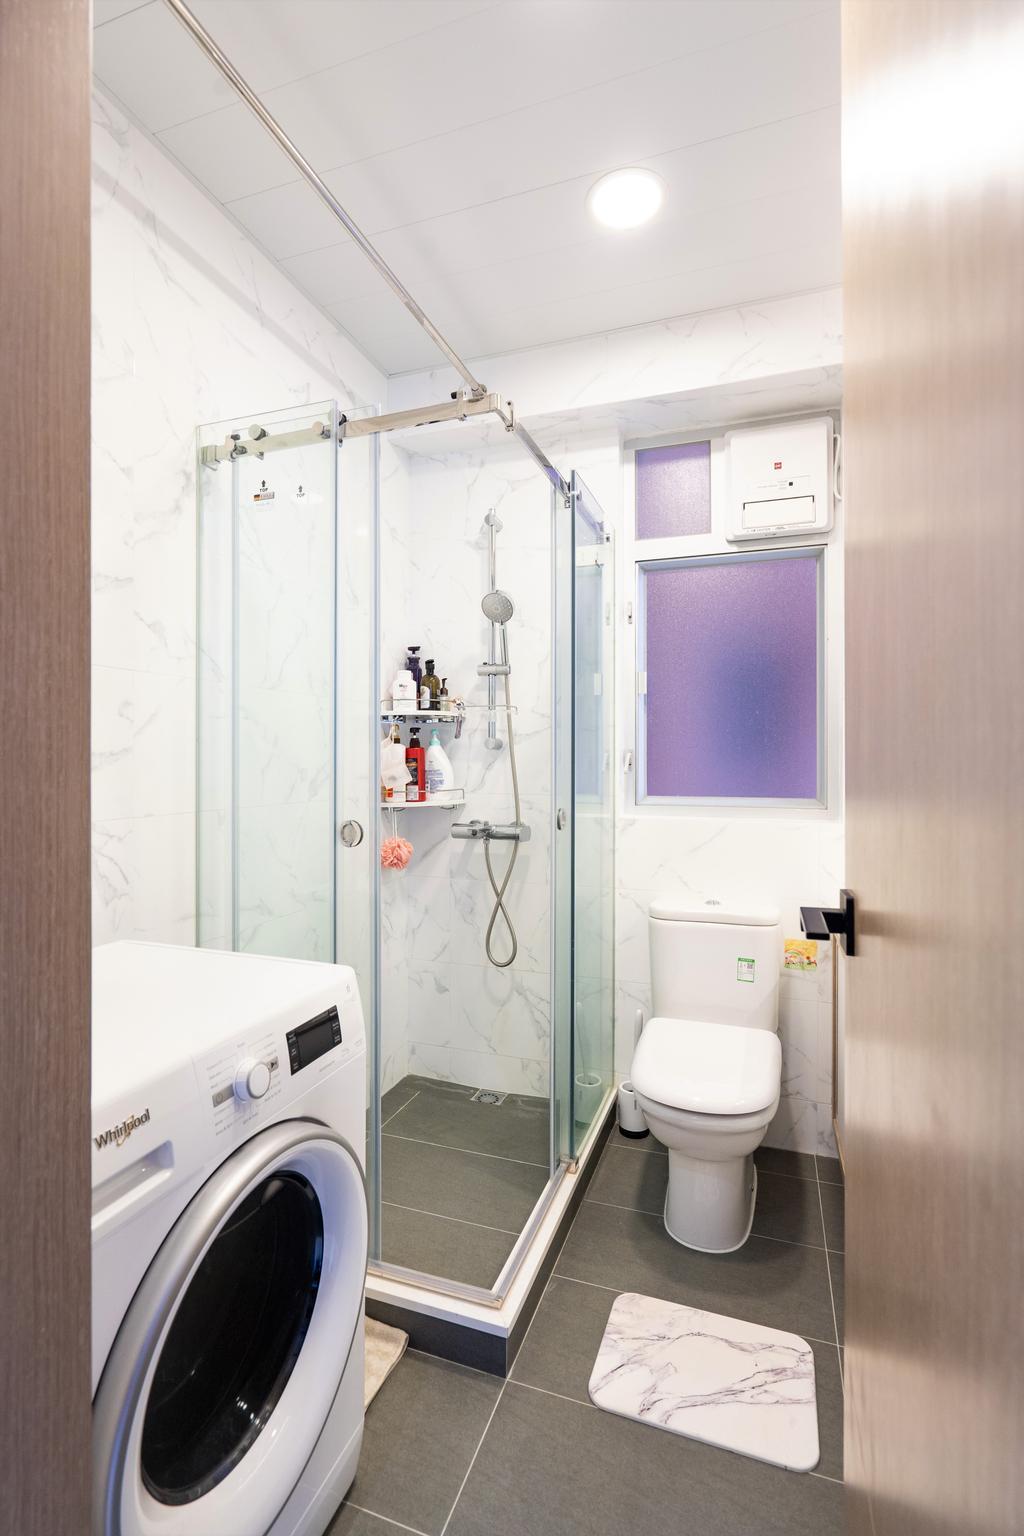 摩登, 私家樓, 浴室, Parc Oasis, 室內設計師, Blue Sky Decoration Design, 北歐